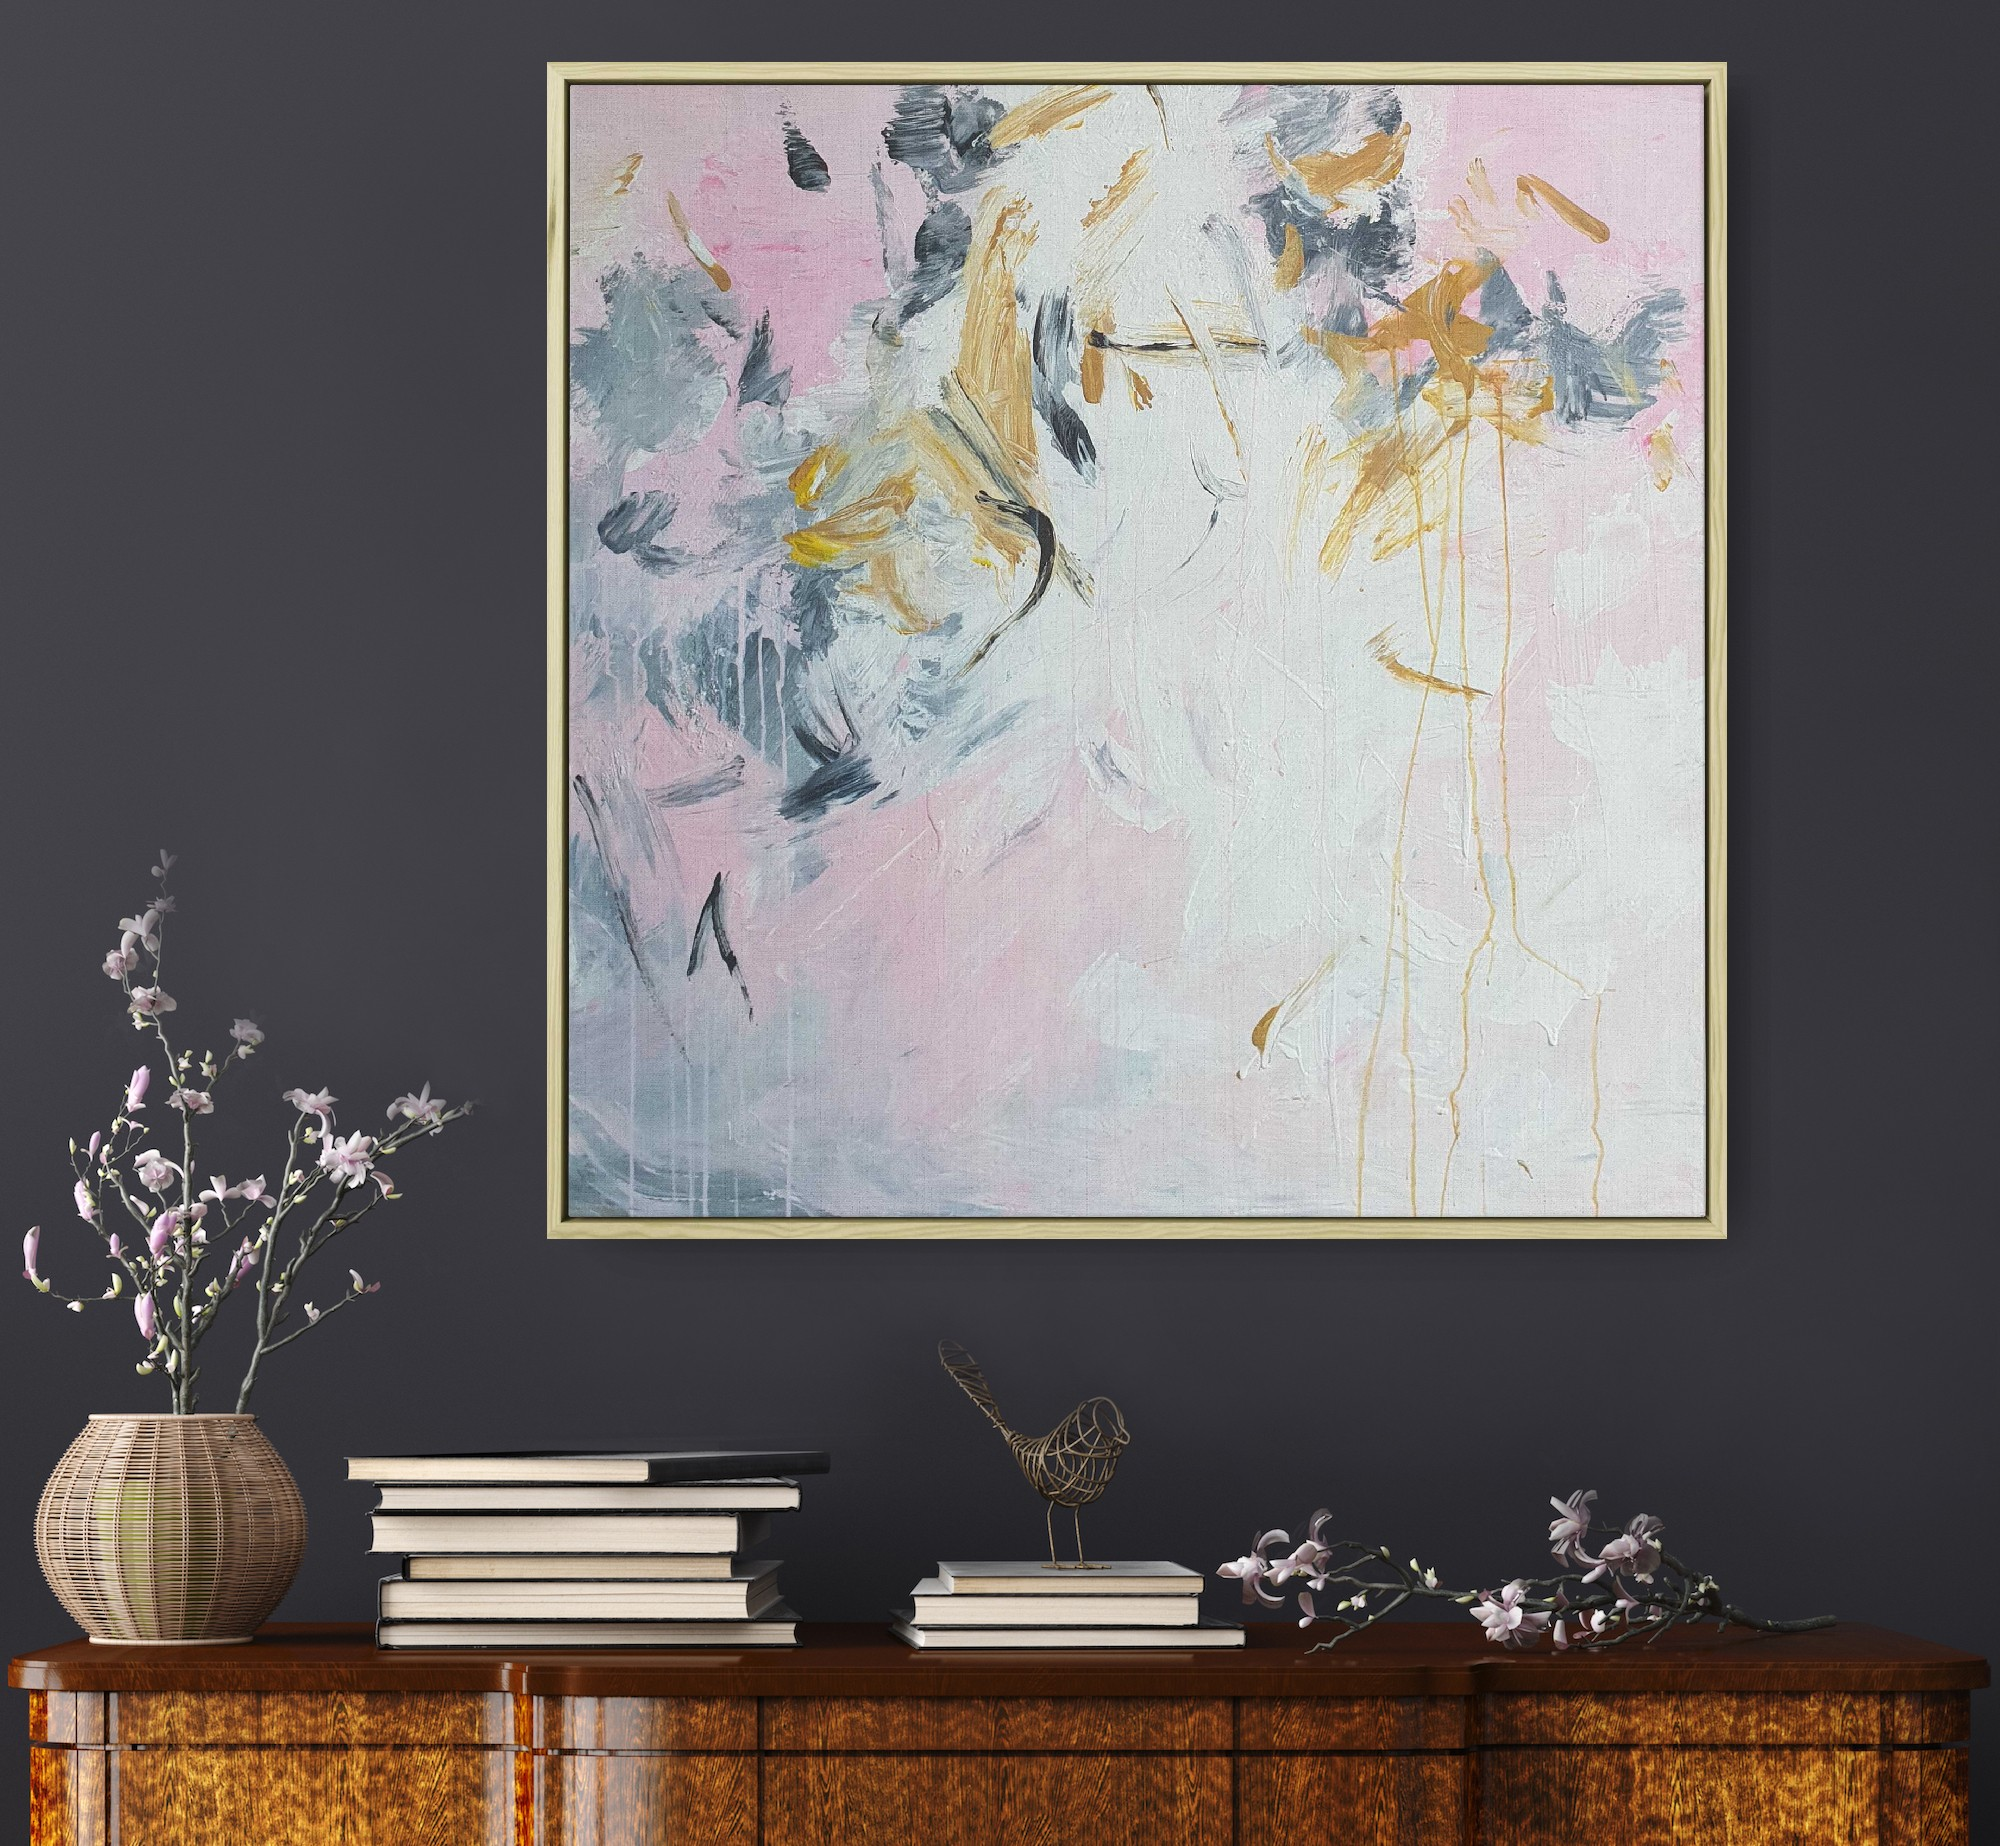 Gabriela Azar Schreiner Large Painting Abstract Art 11dg4